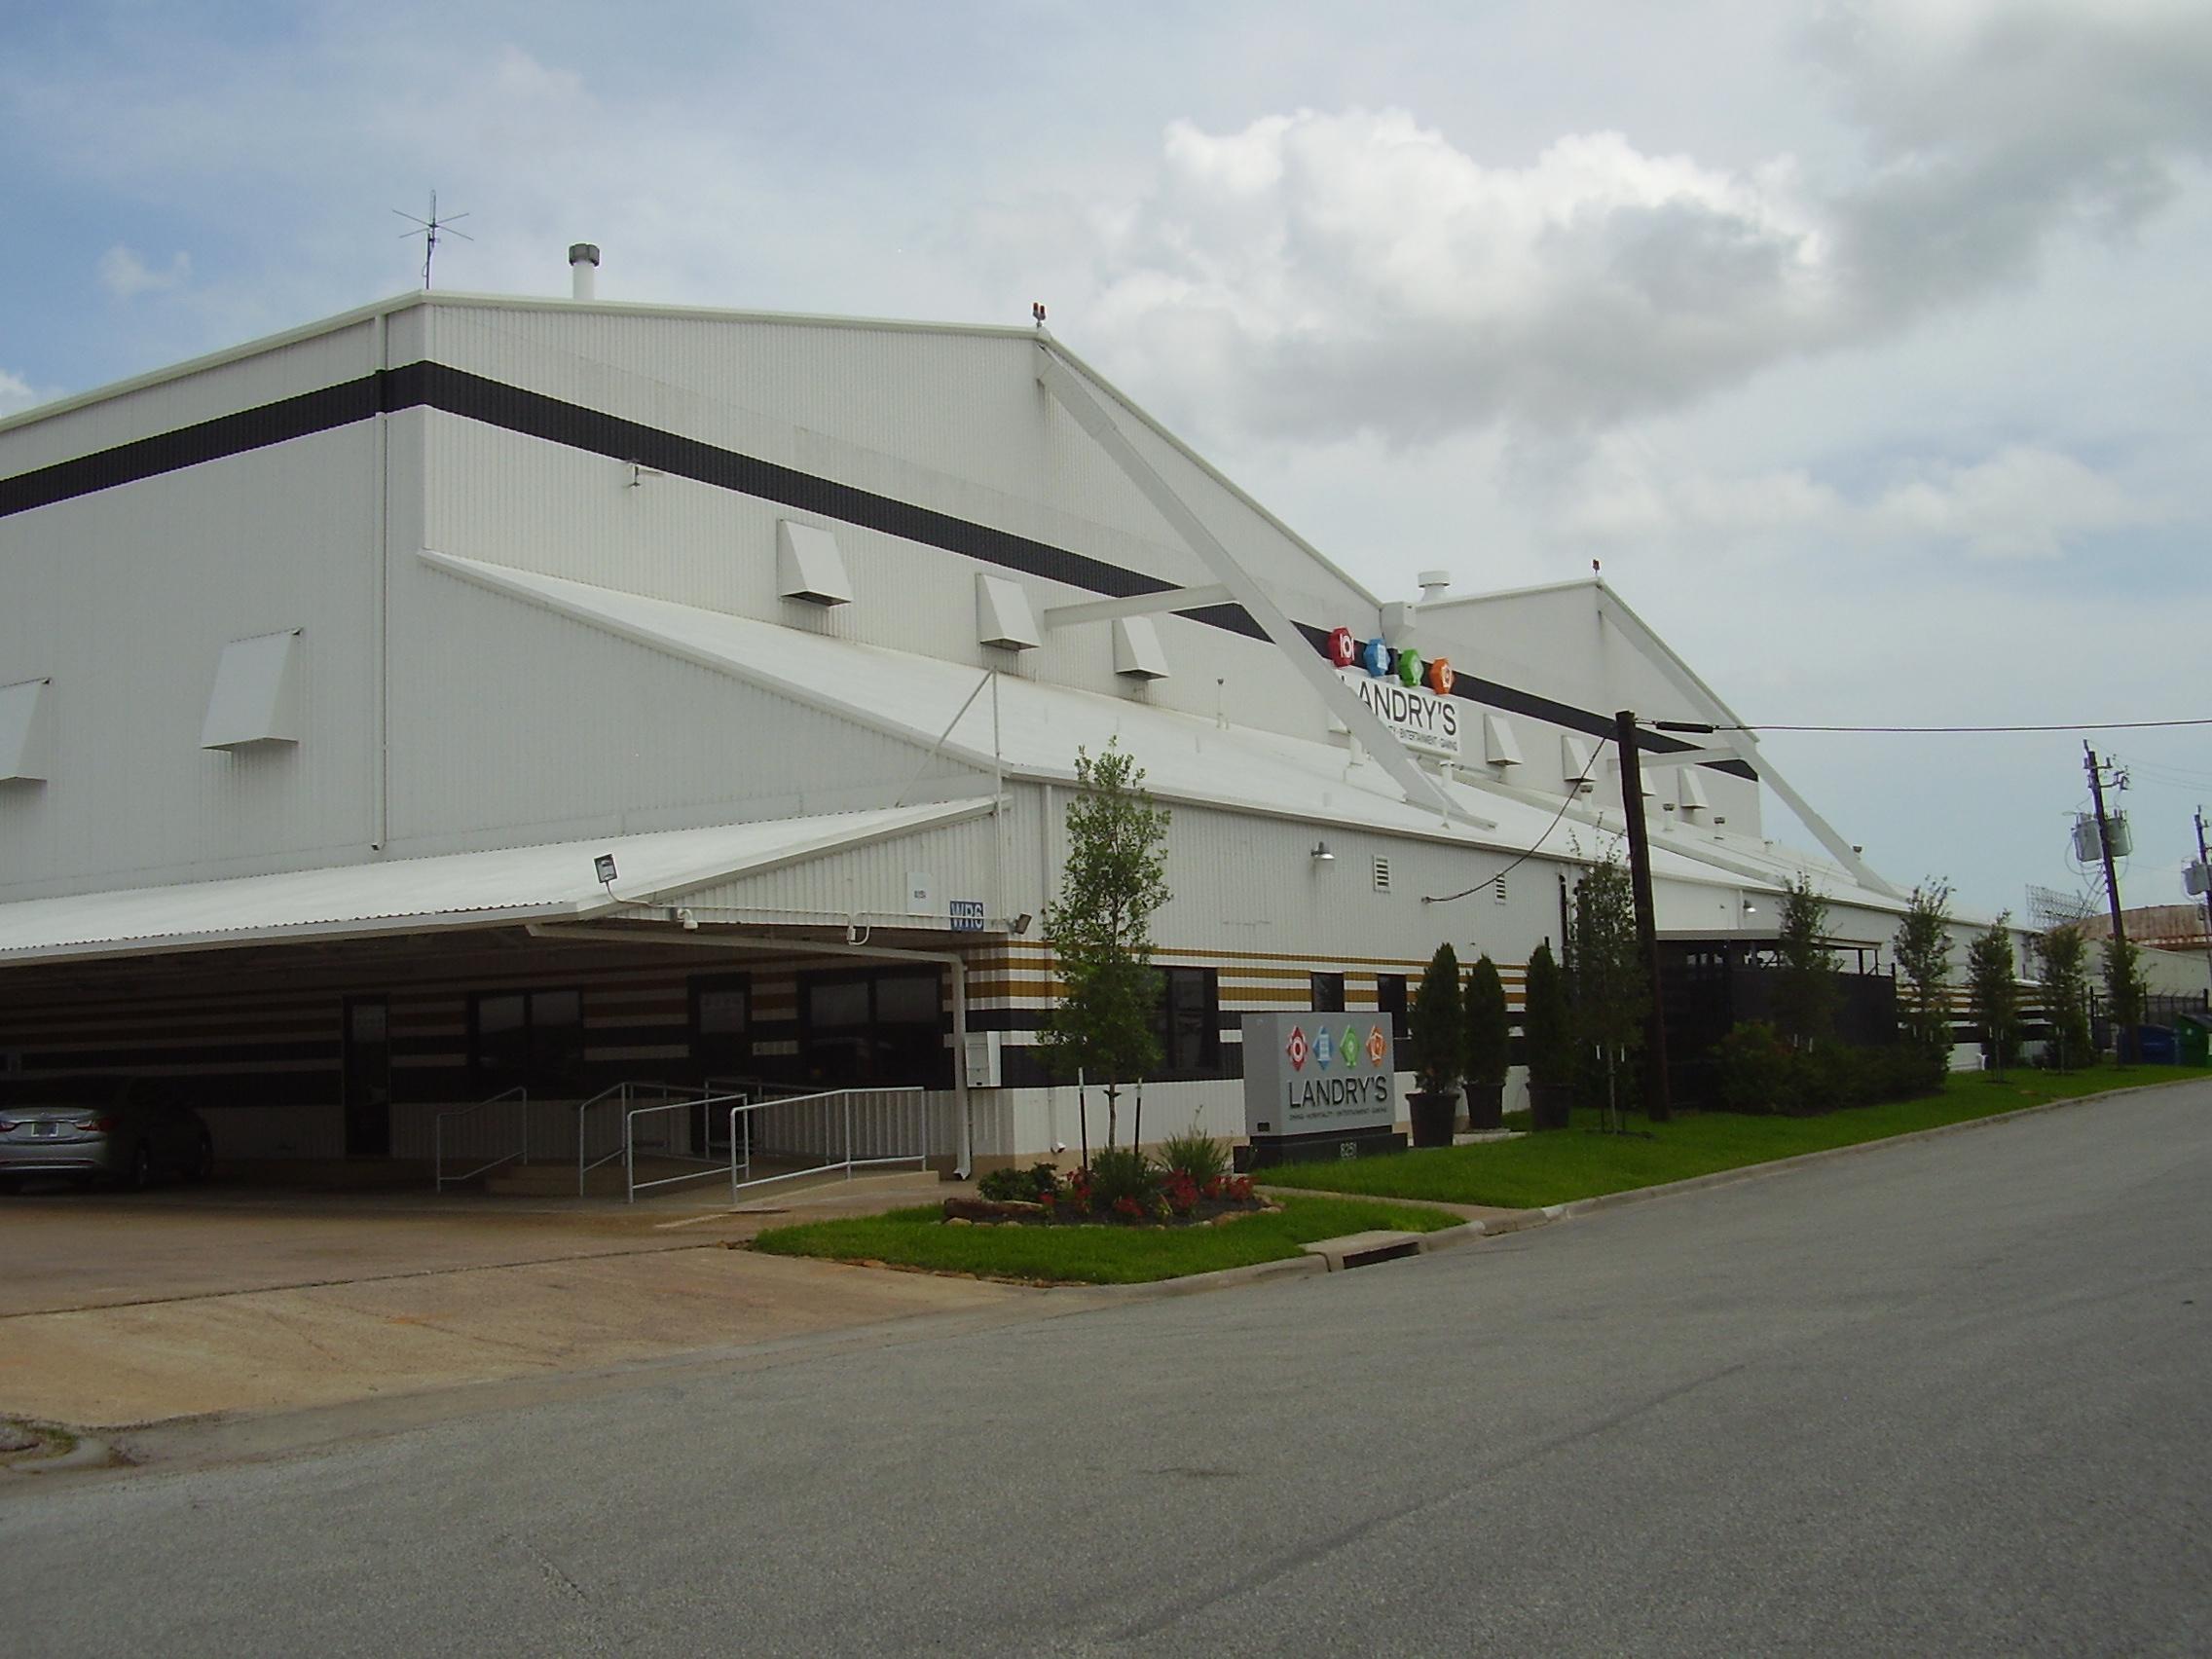 Landry's, Inc. - Wikipedia